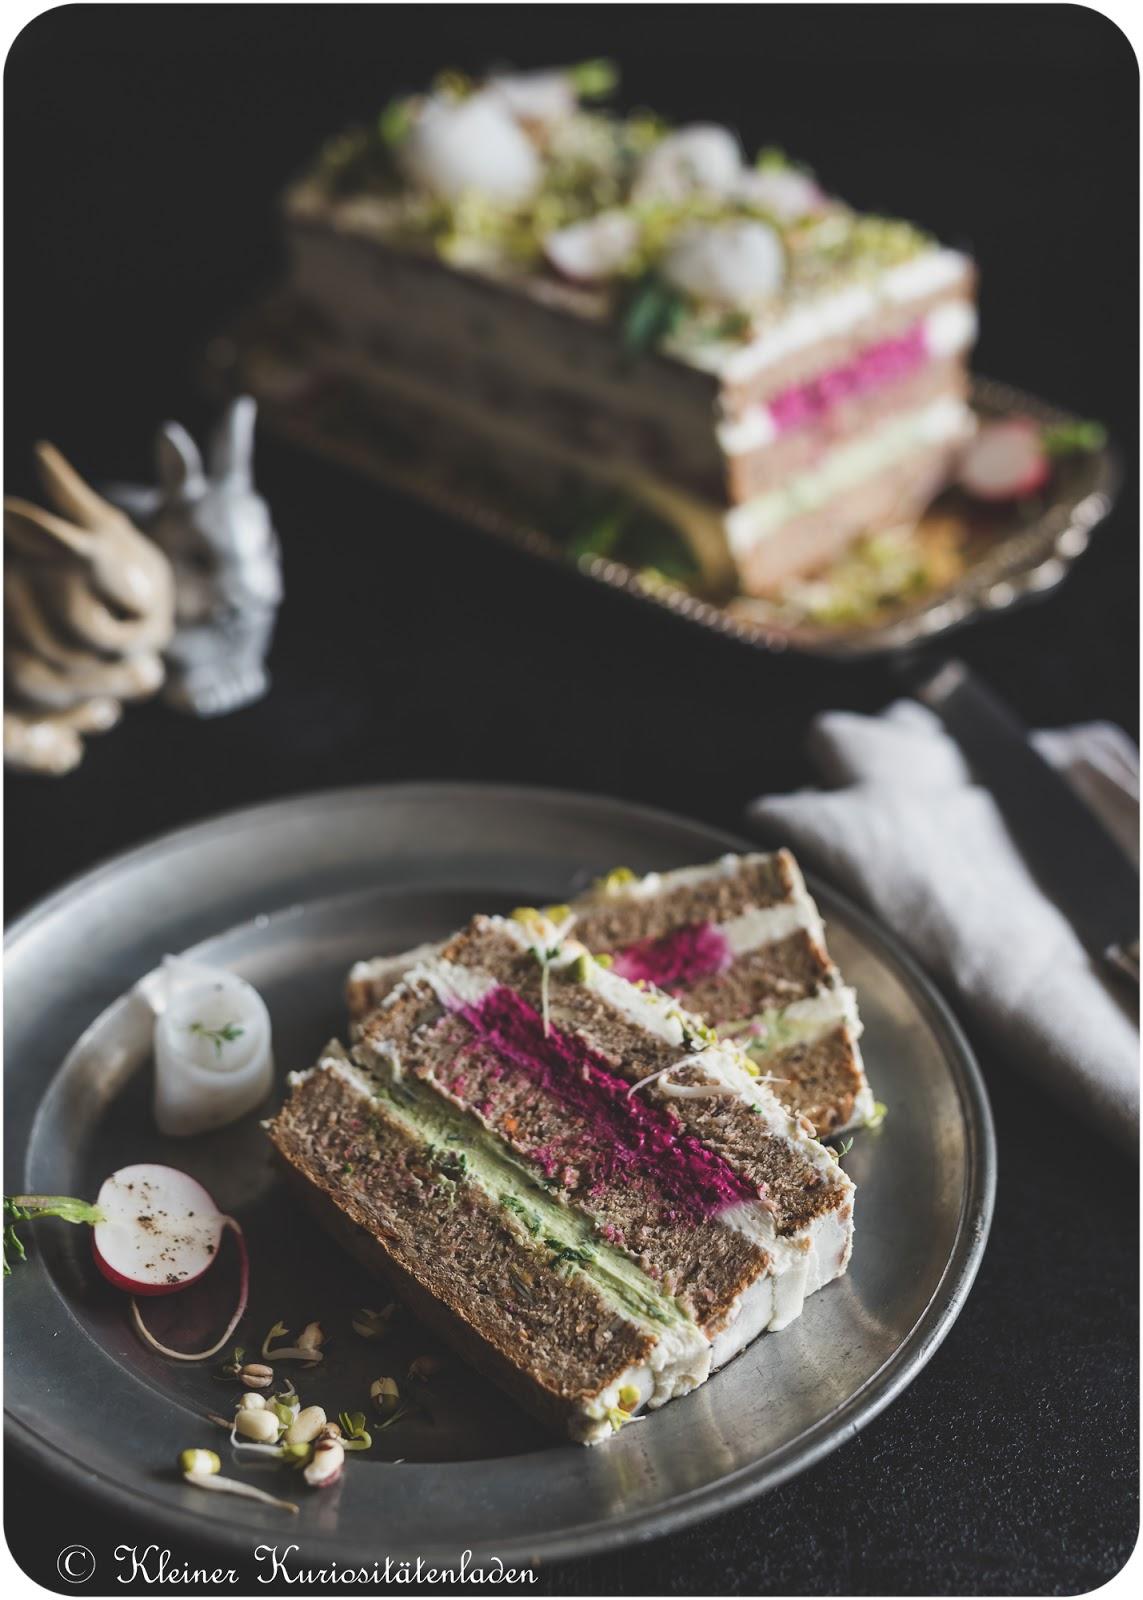 Svartbröd Smörgåstårta | Schwarzbrot-Sandwichtorte